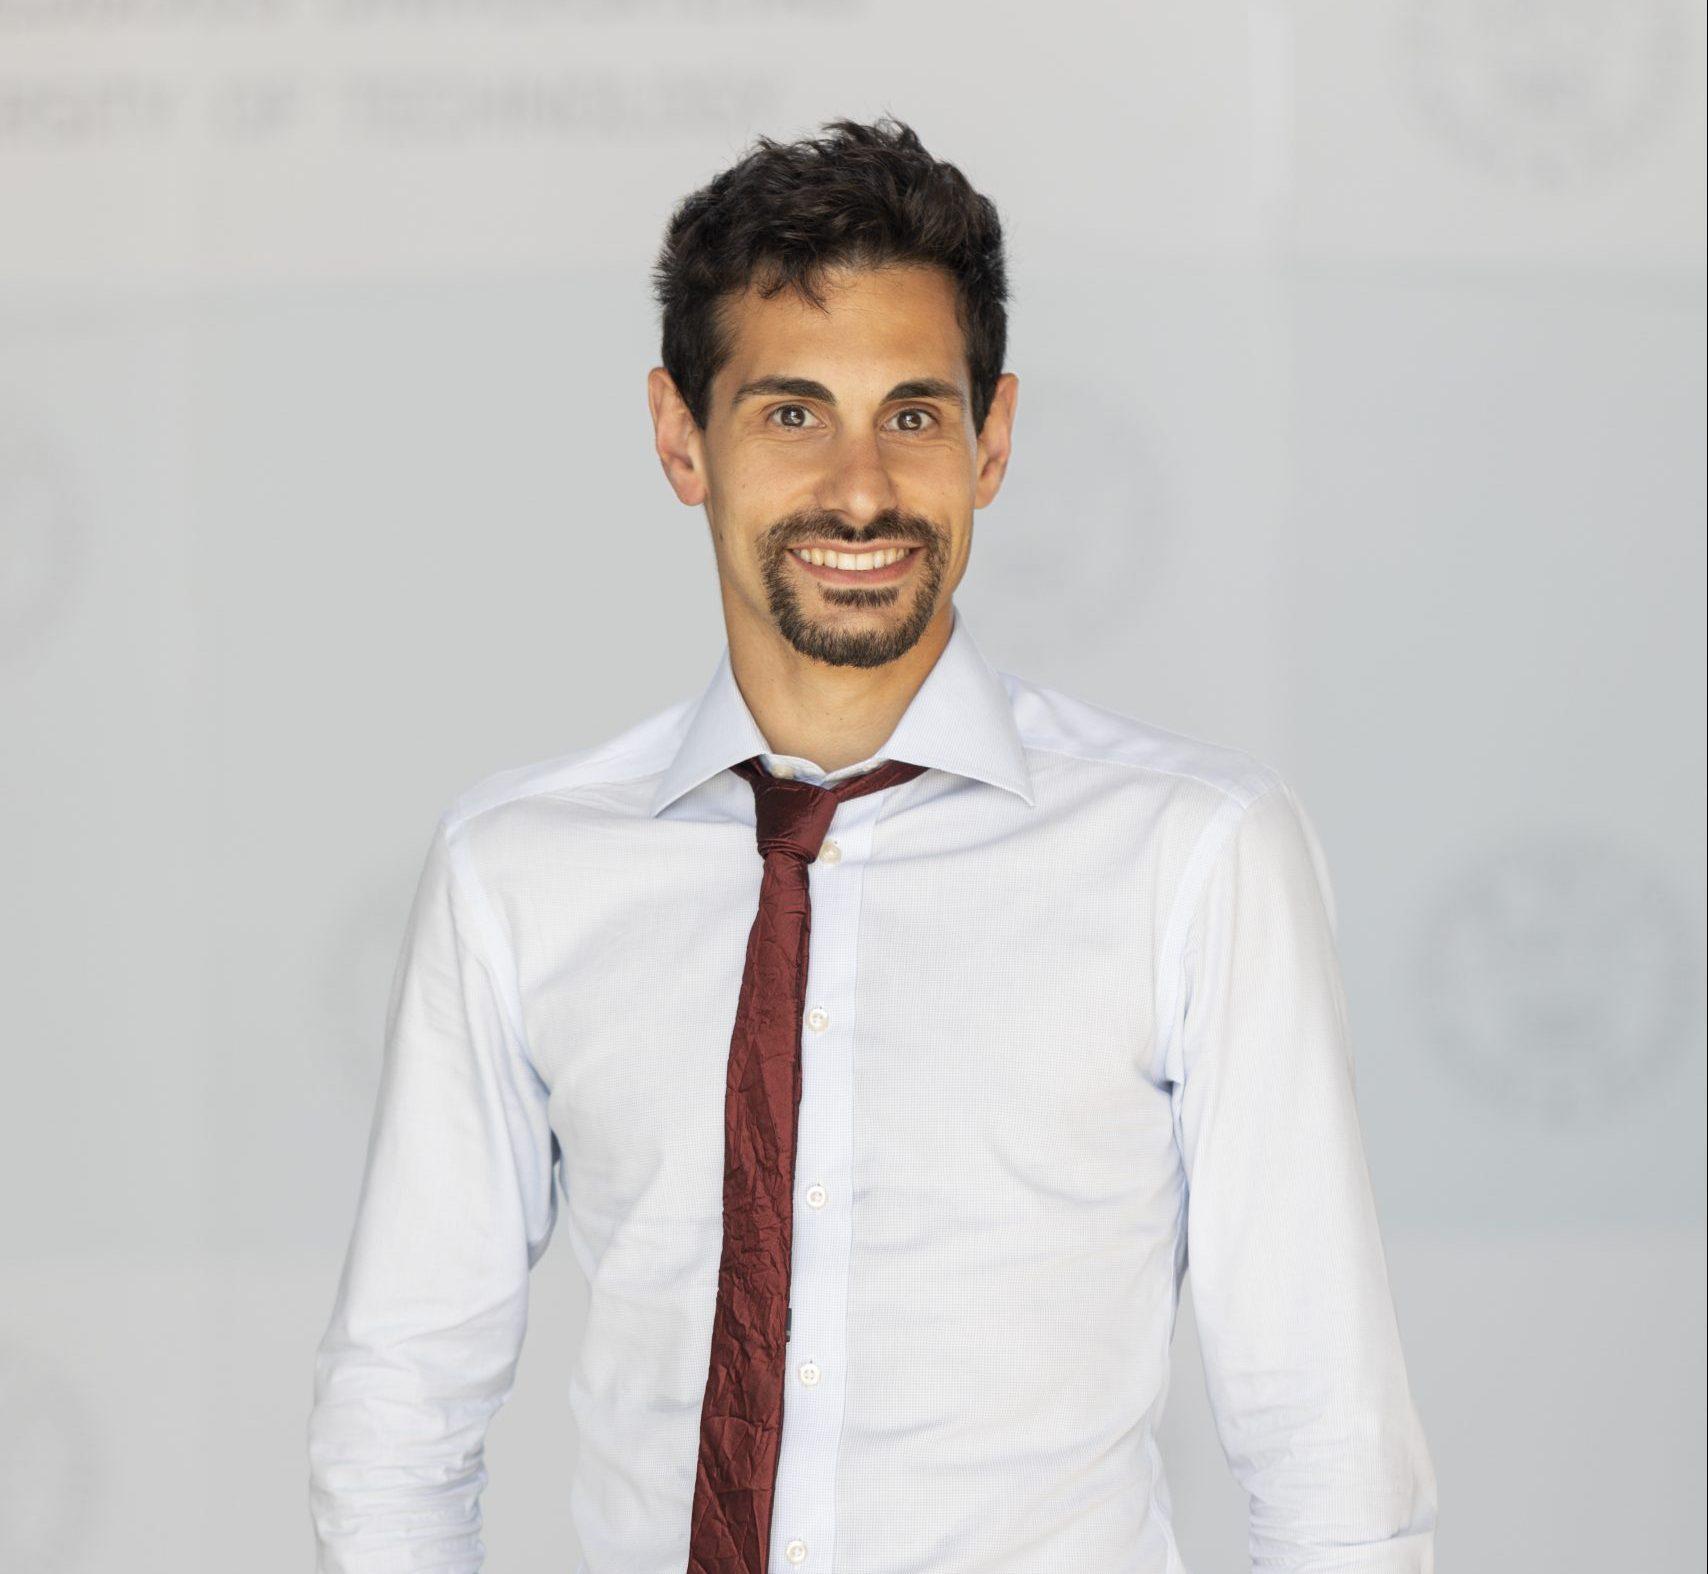 Alessandro Stefanini